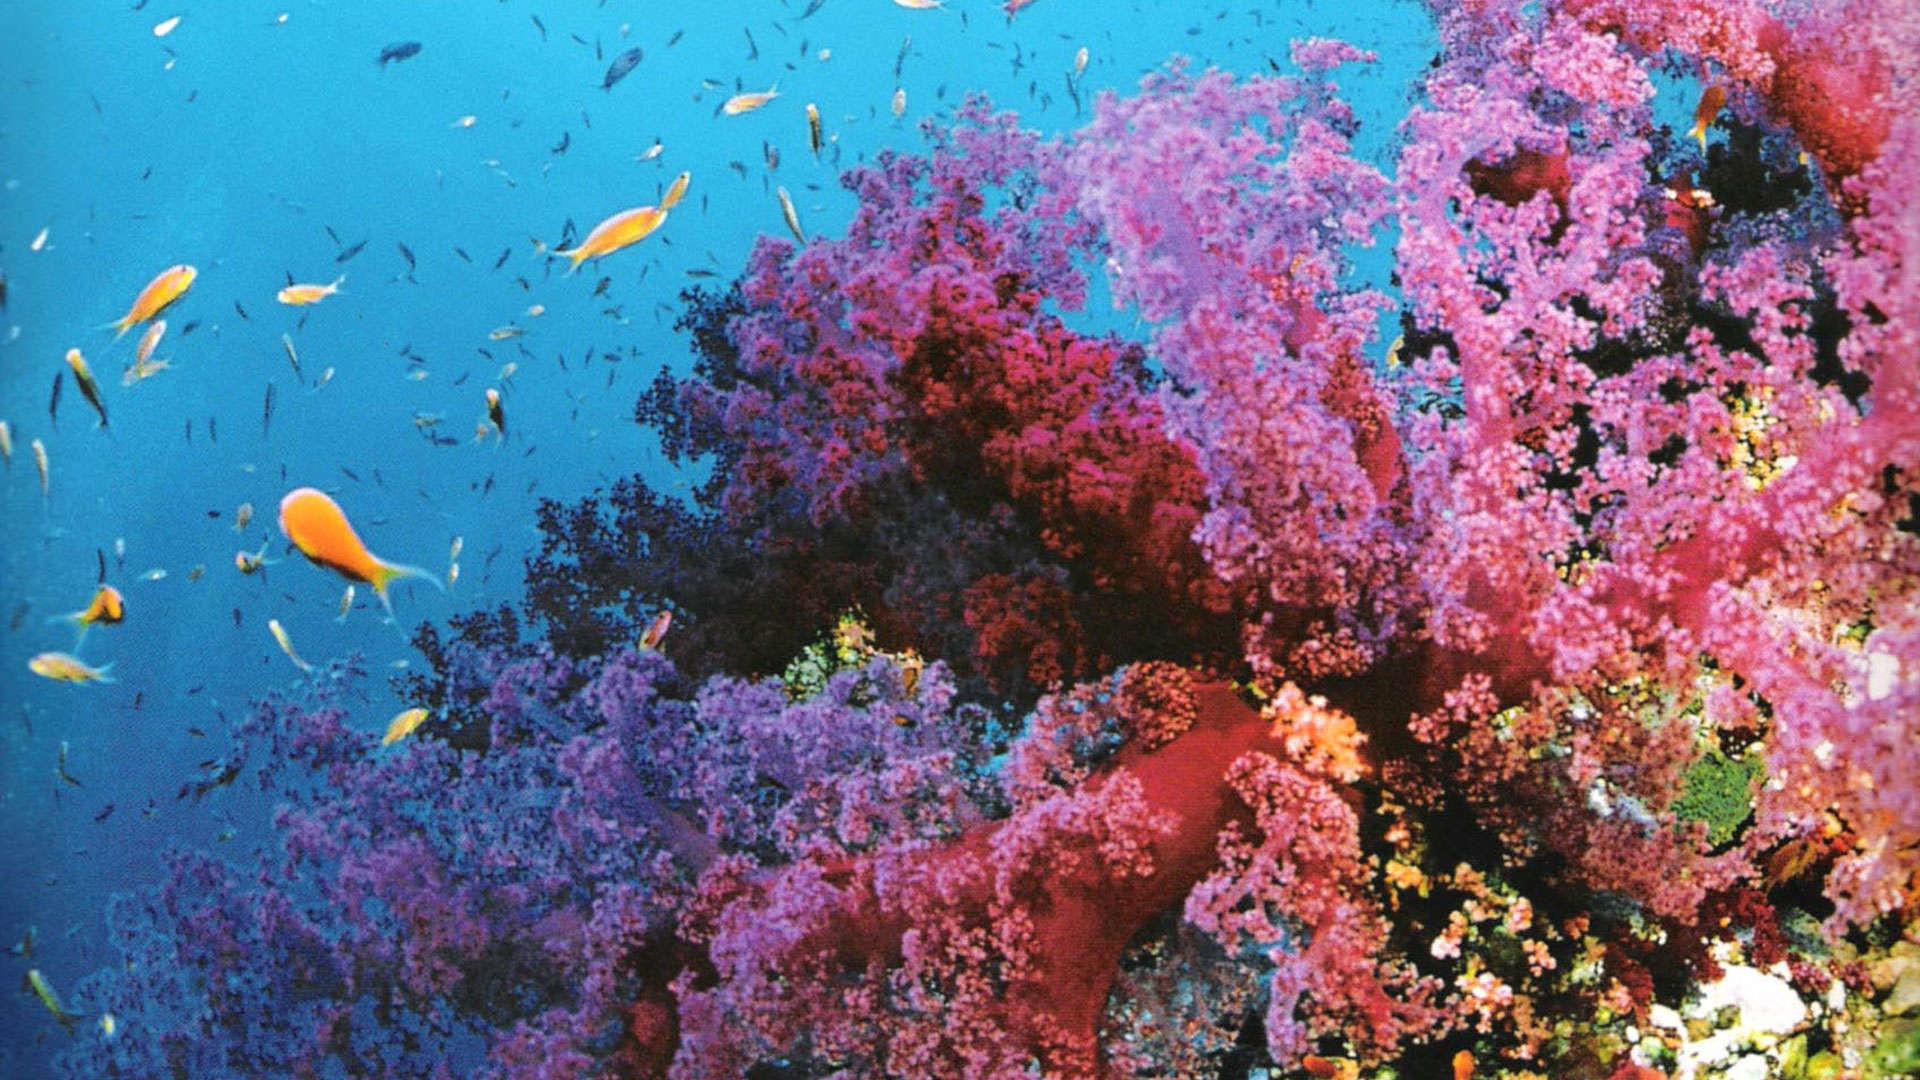 Reef Wallpaper Great Barrier Reef Wallpaper Great Barrier Reef Fish .